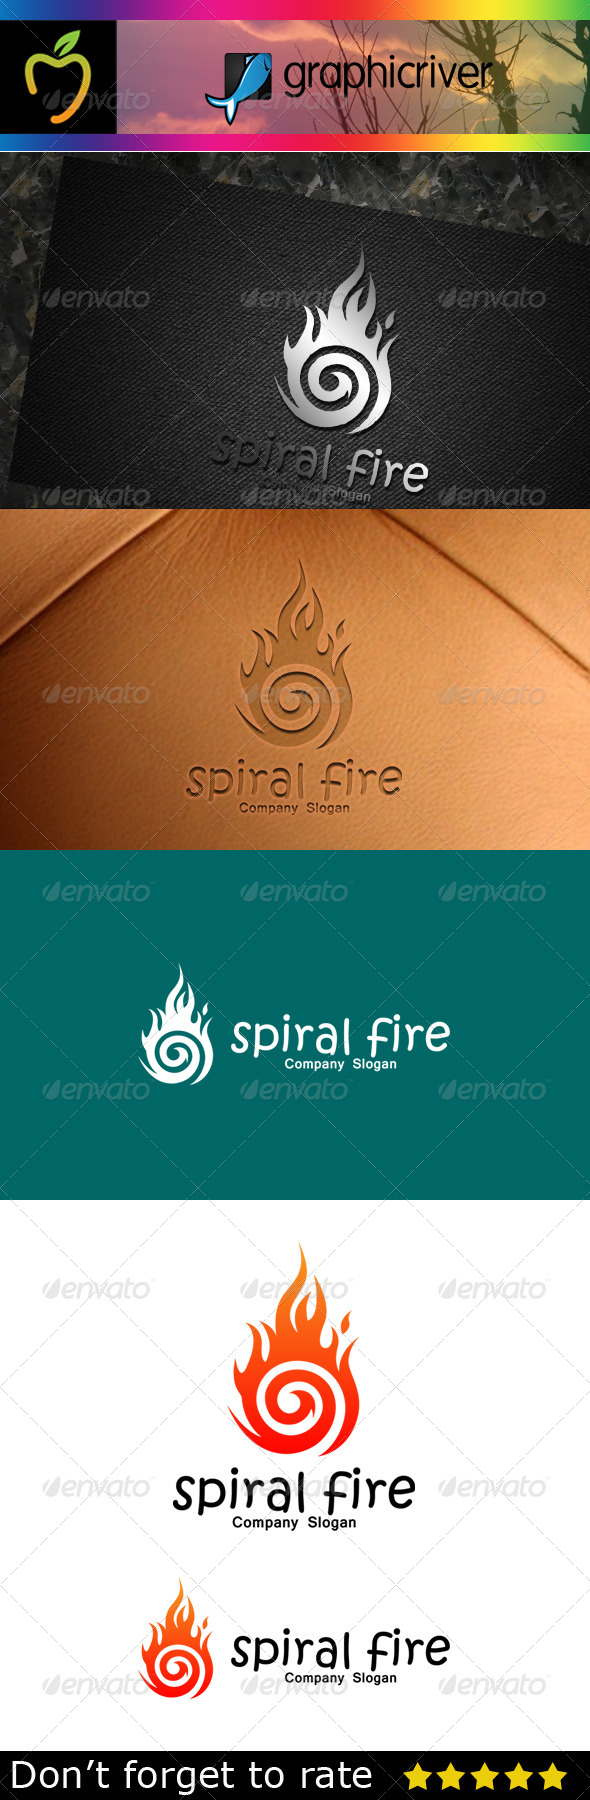 GraphicRiver Spiral Fire Logo 7714652